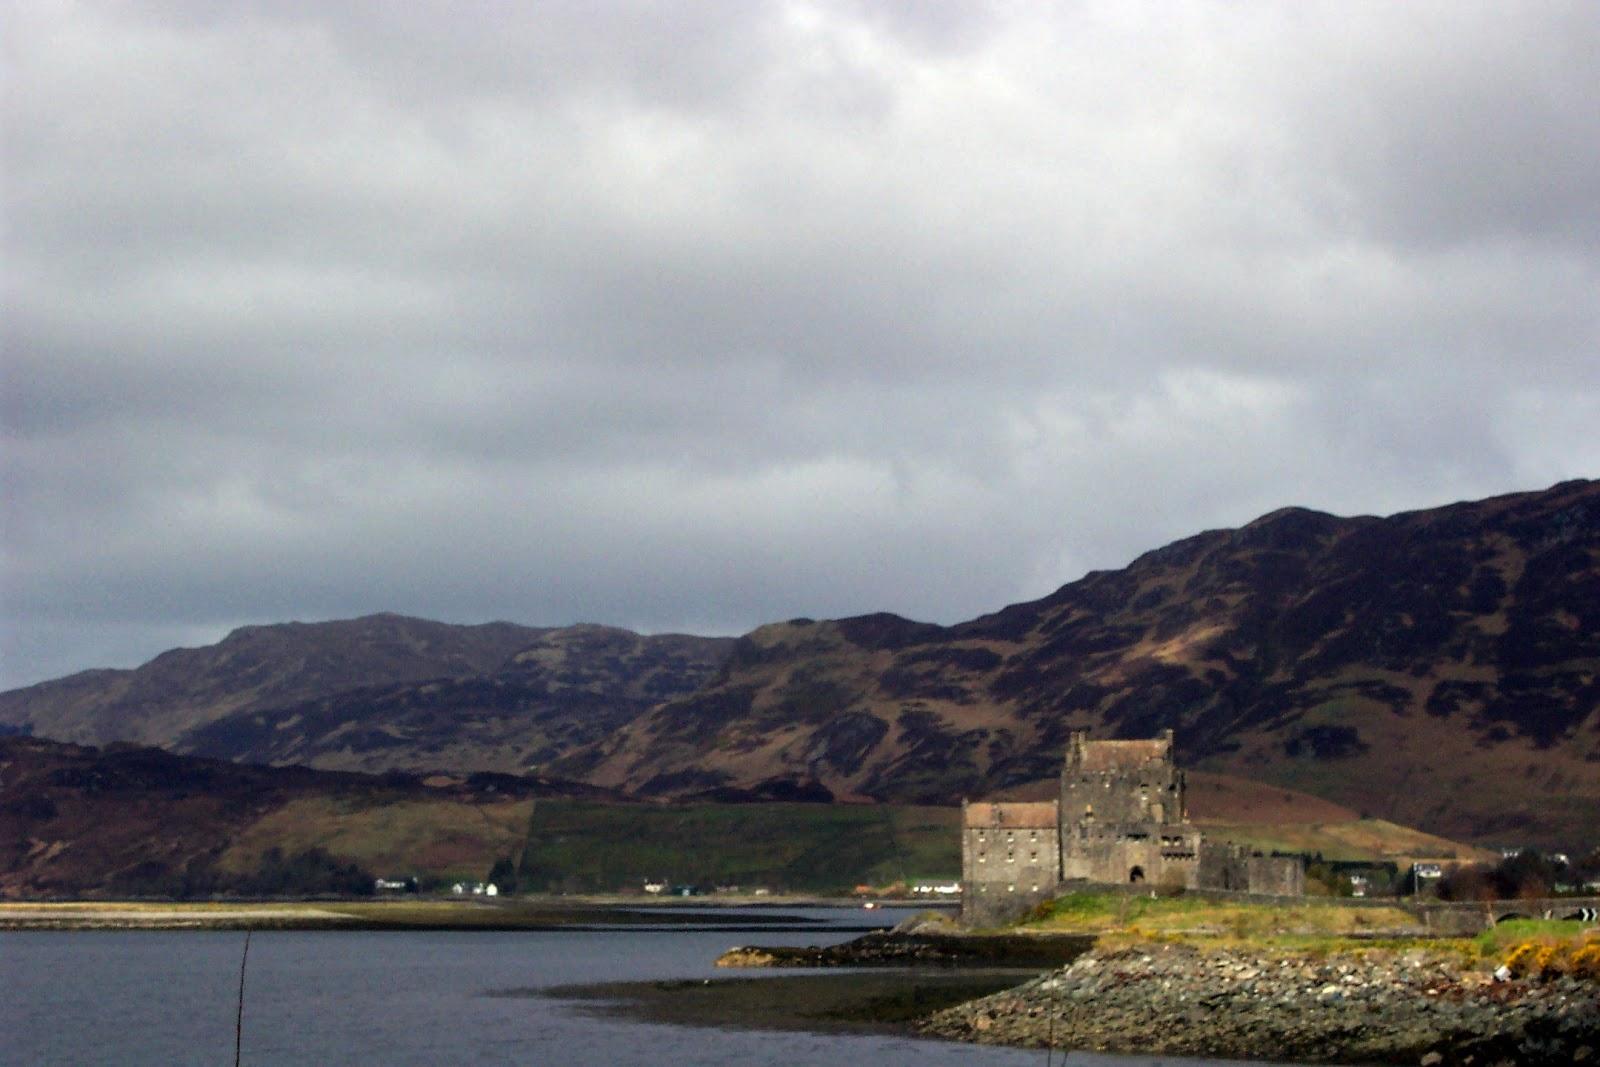 http://1.bp.blogspot.com/-_cfiKyO7Kb8/T0aJh46QwRI/AAAAAAAADUQ/egmoJr3zF70/s1600/Eilean_Donan_Castle2_Scotland.jpg